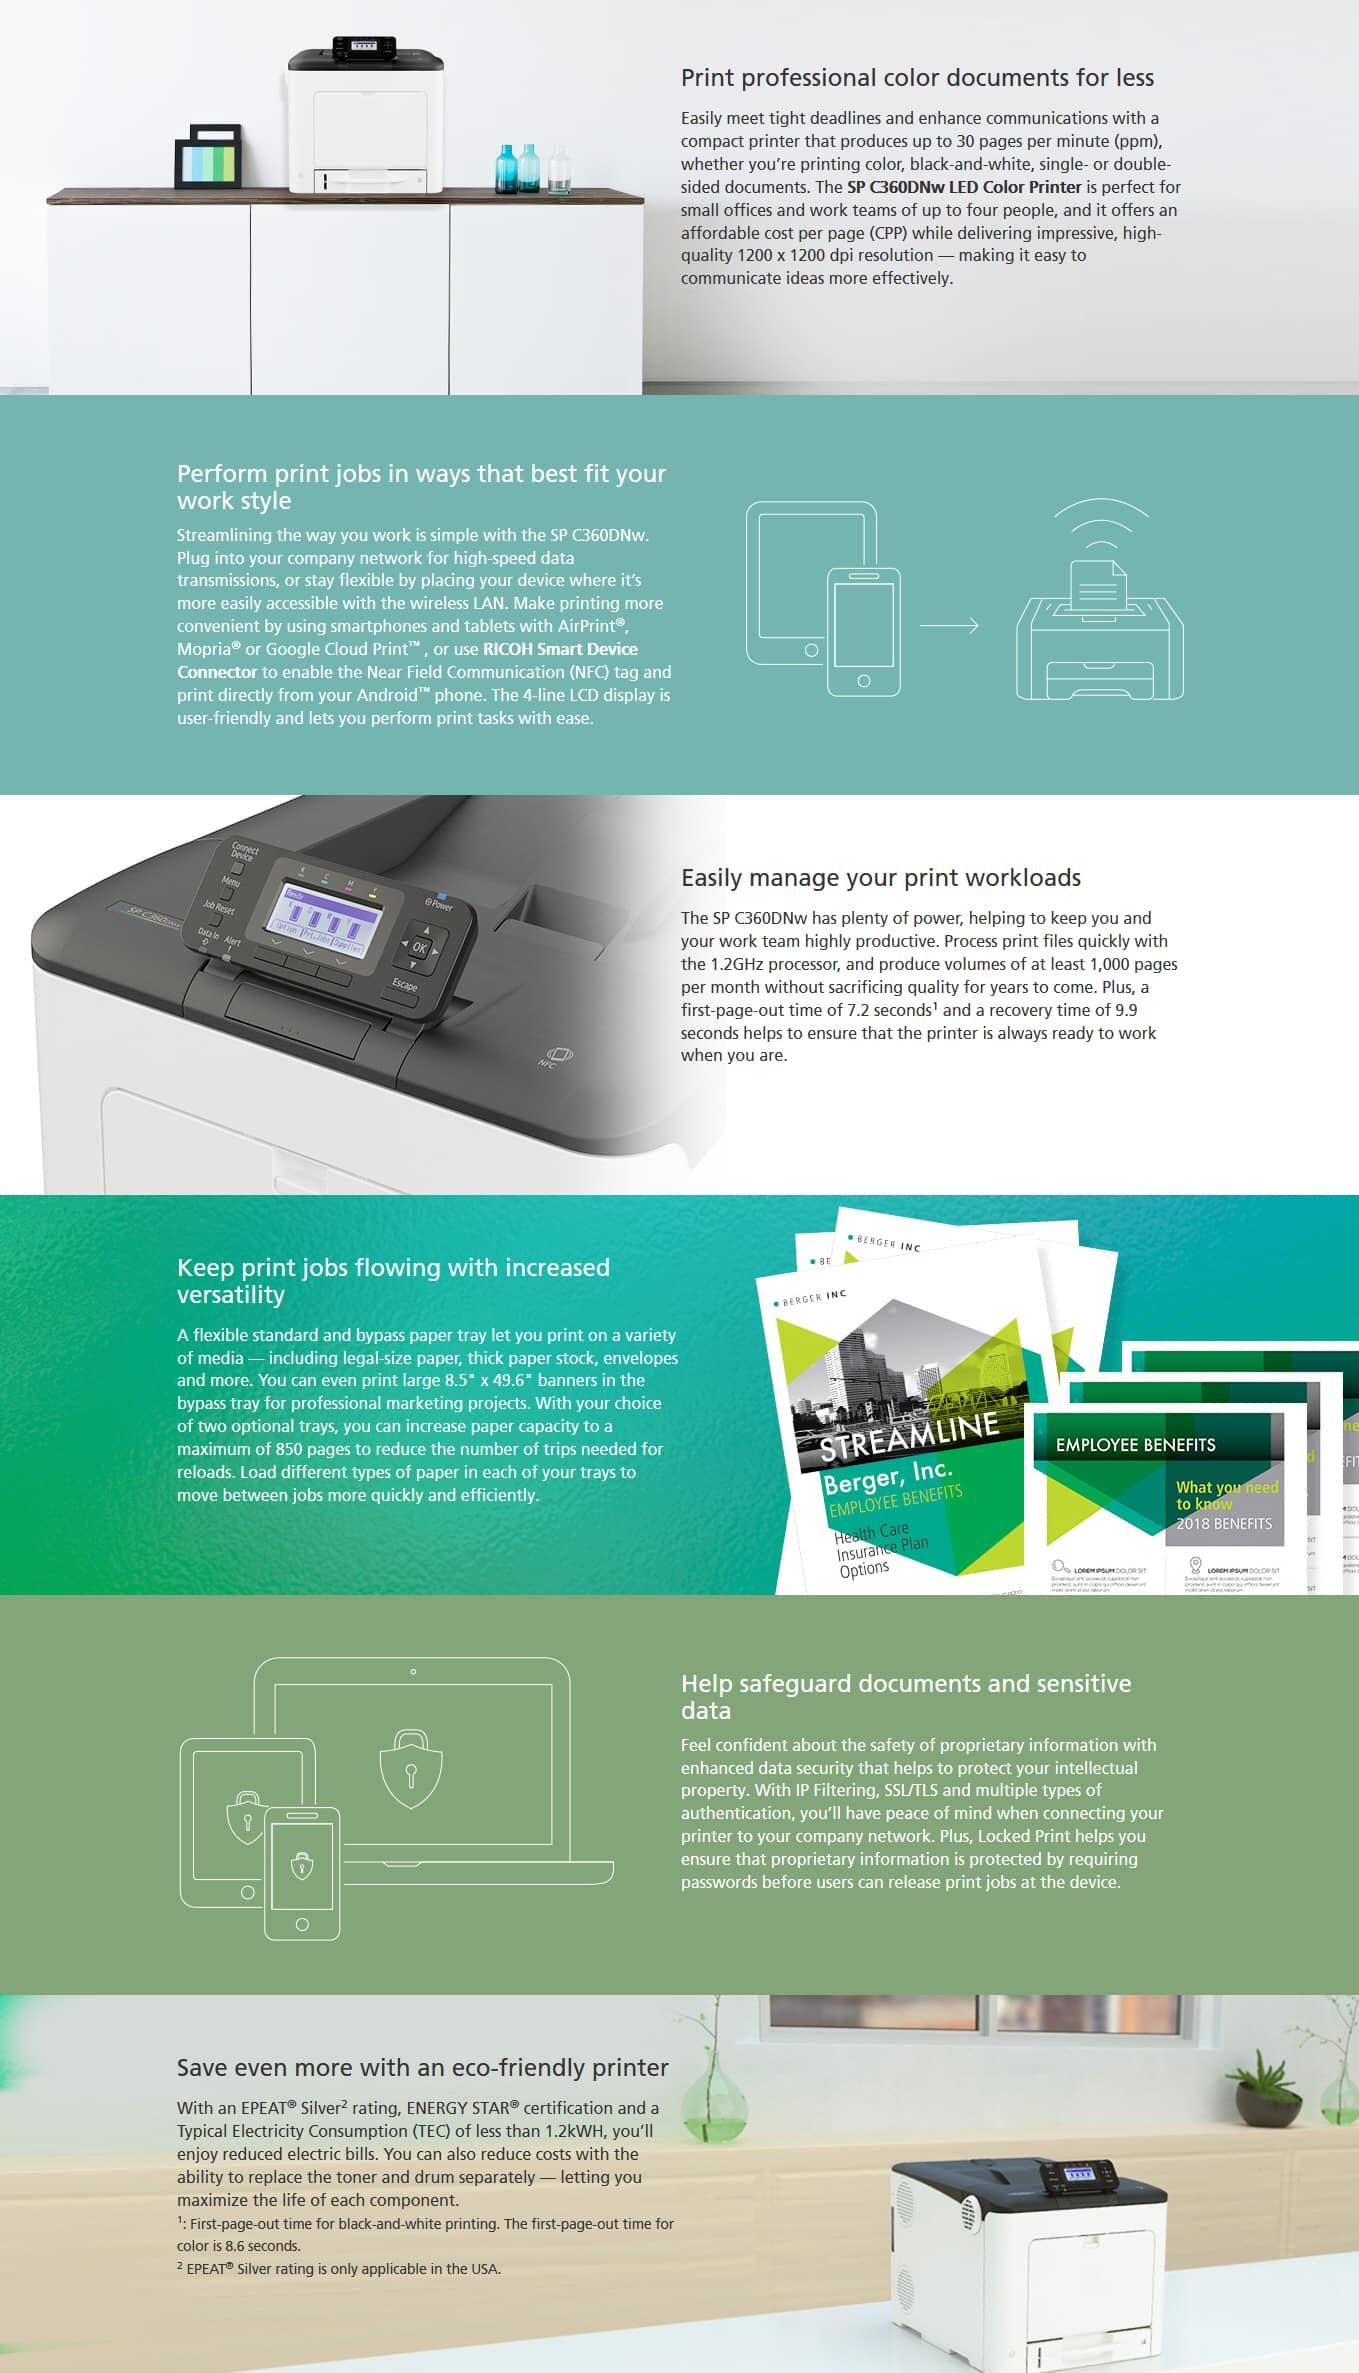 Savin SP C360DNw Color LED Printer 6